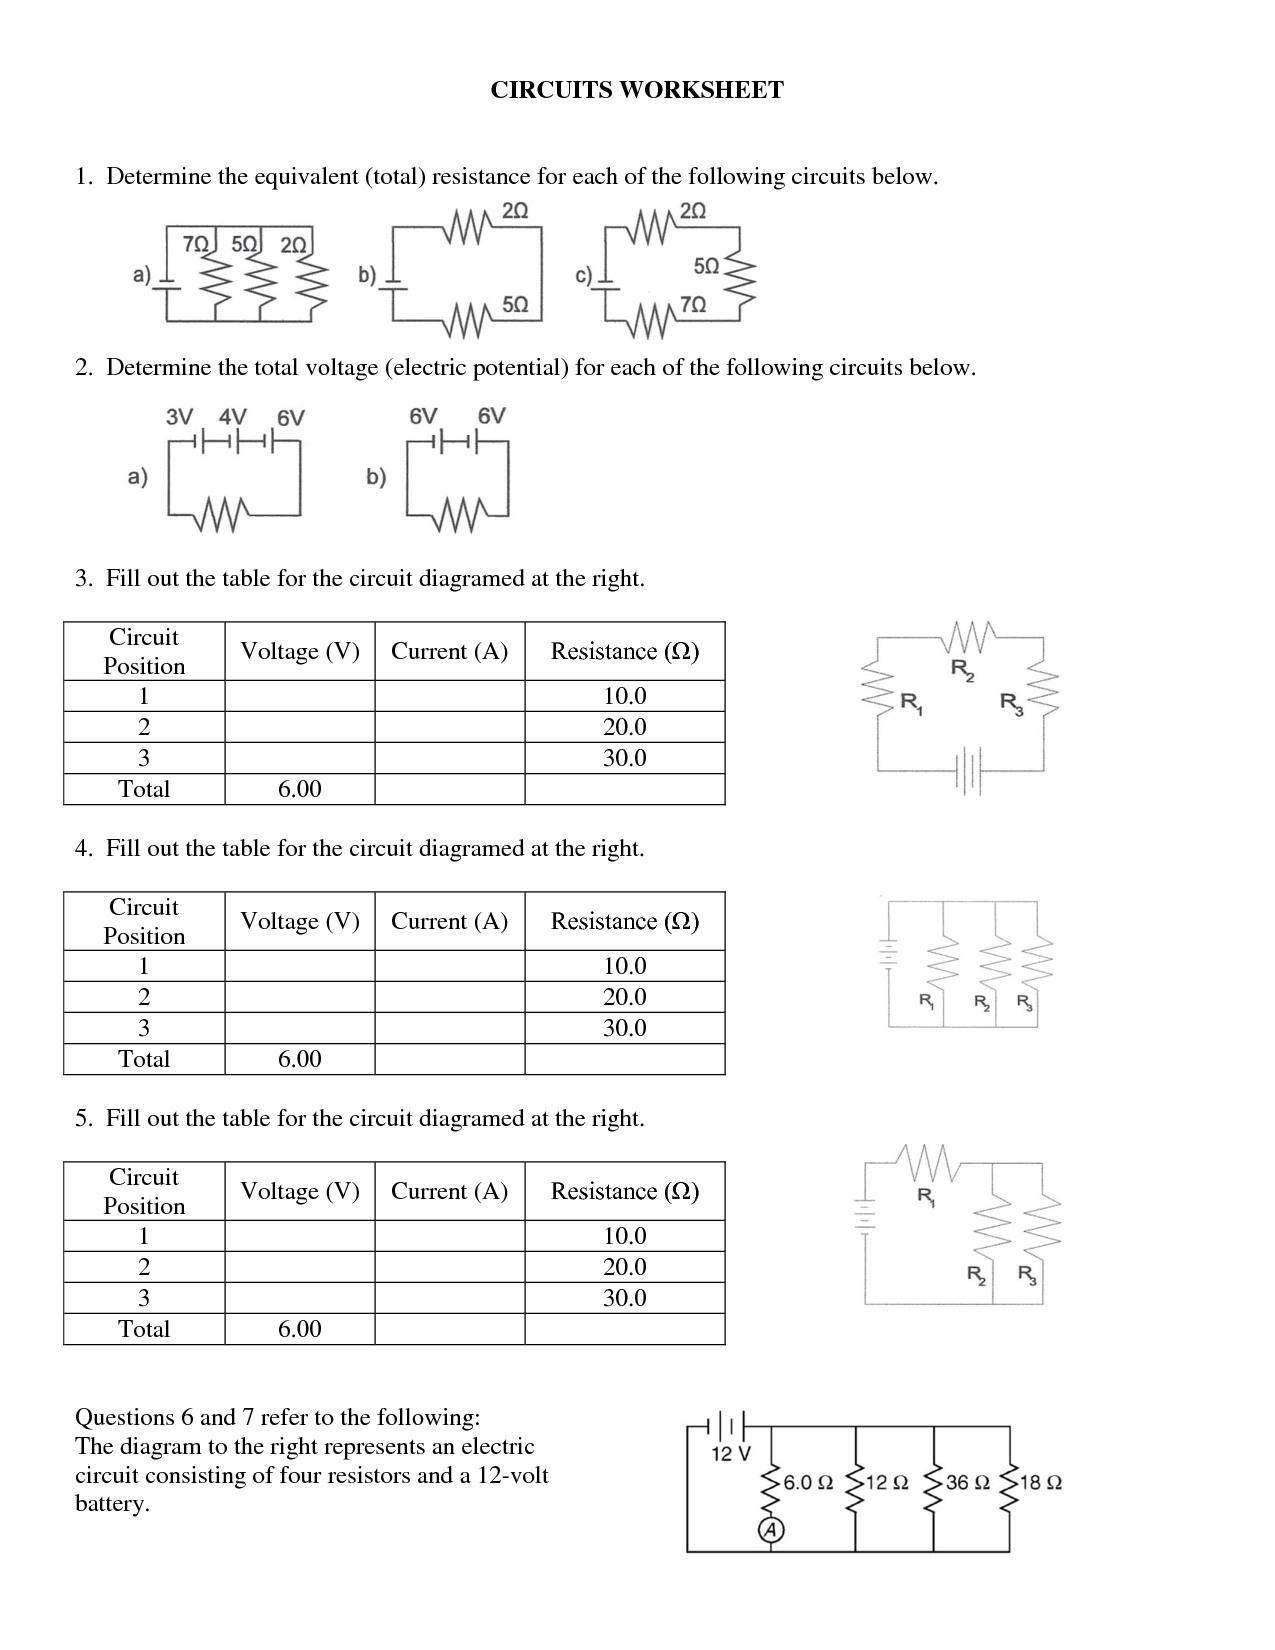 Worksheet Works Linear